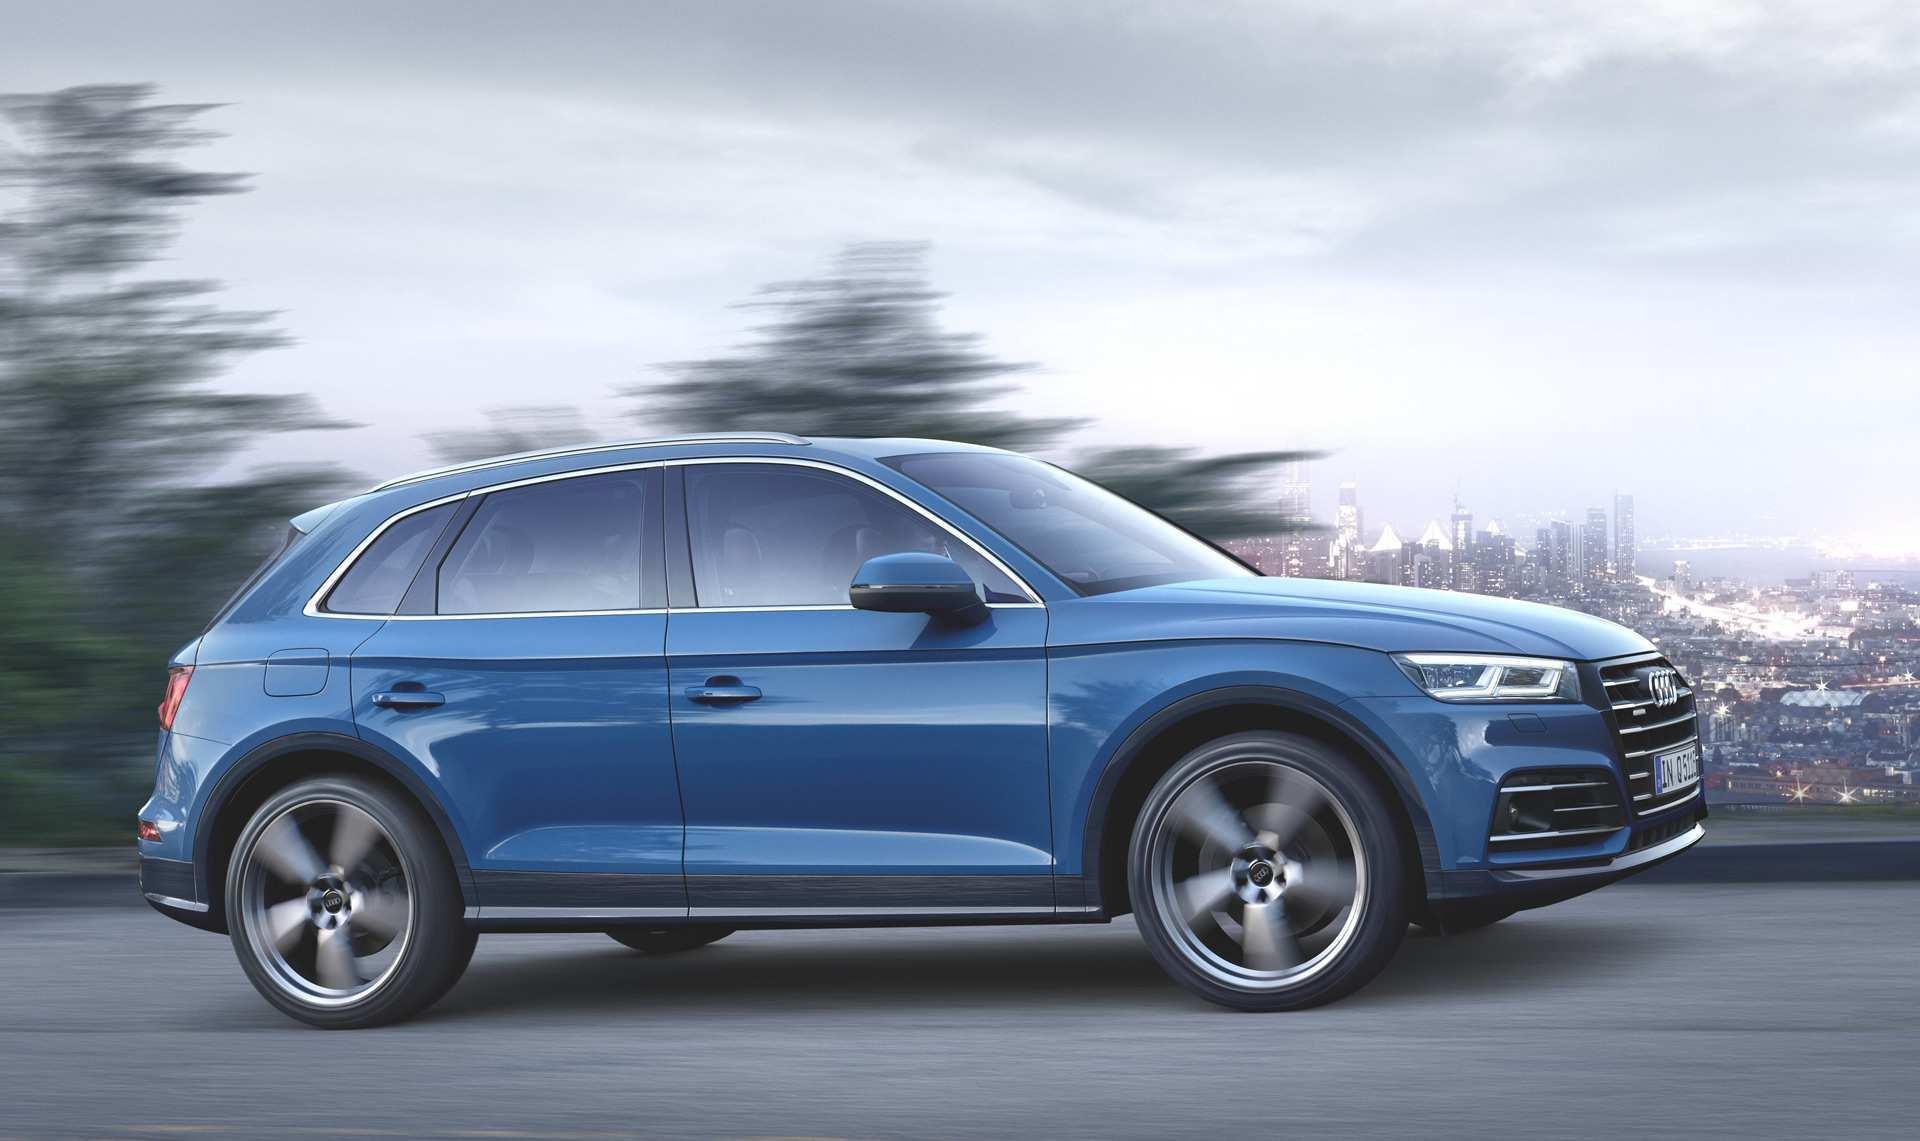 62 Gallery of Audi Hybrid Cars 2020 Spy Shoot for Audi Hybrid Cars 2020